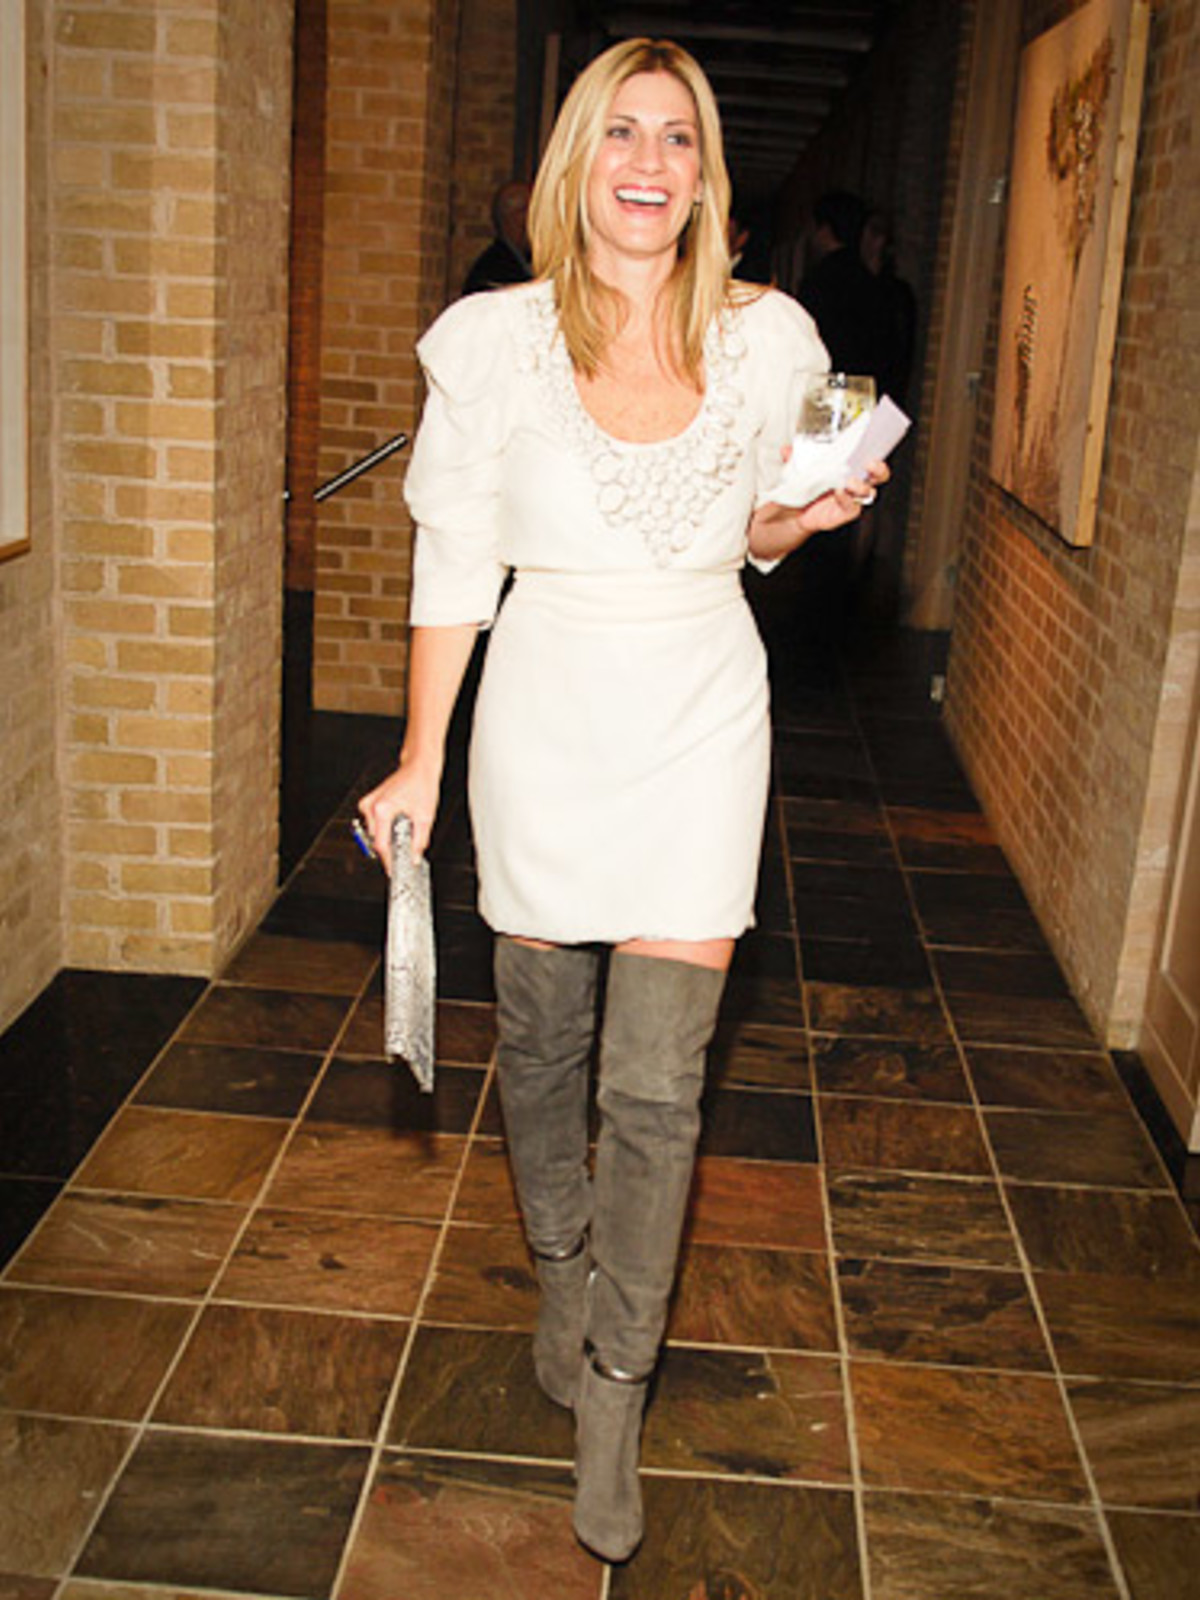 News_Vogue at Becca_Feb.2010_Greggory Burk